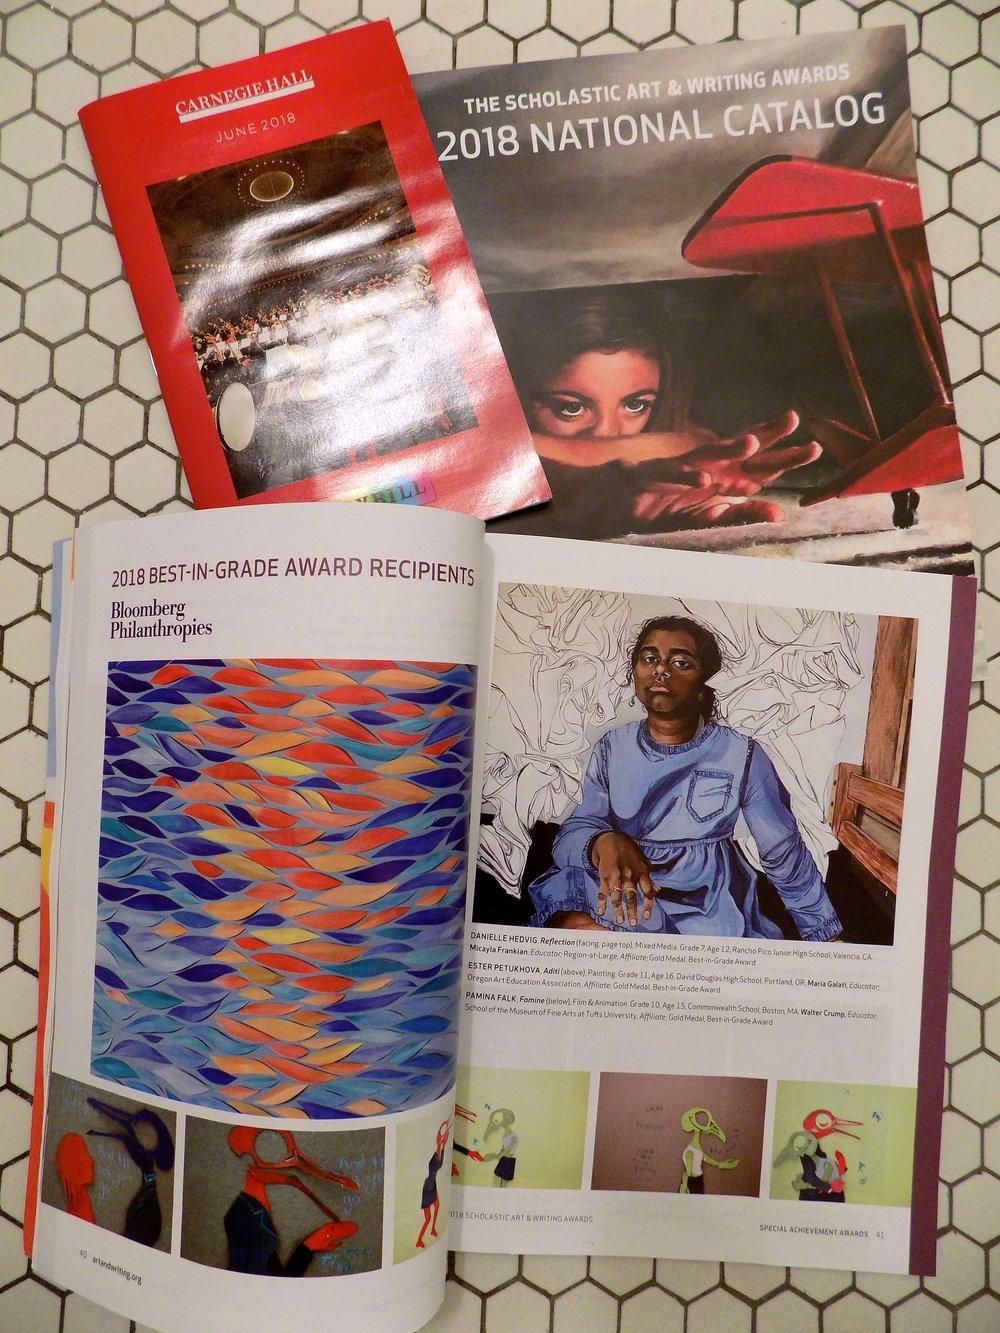 2018-ArtGrant-ScholasticPUBLICATIONS.jpg